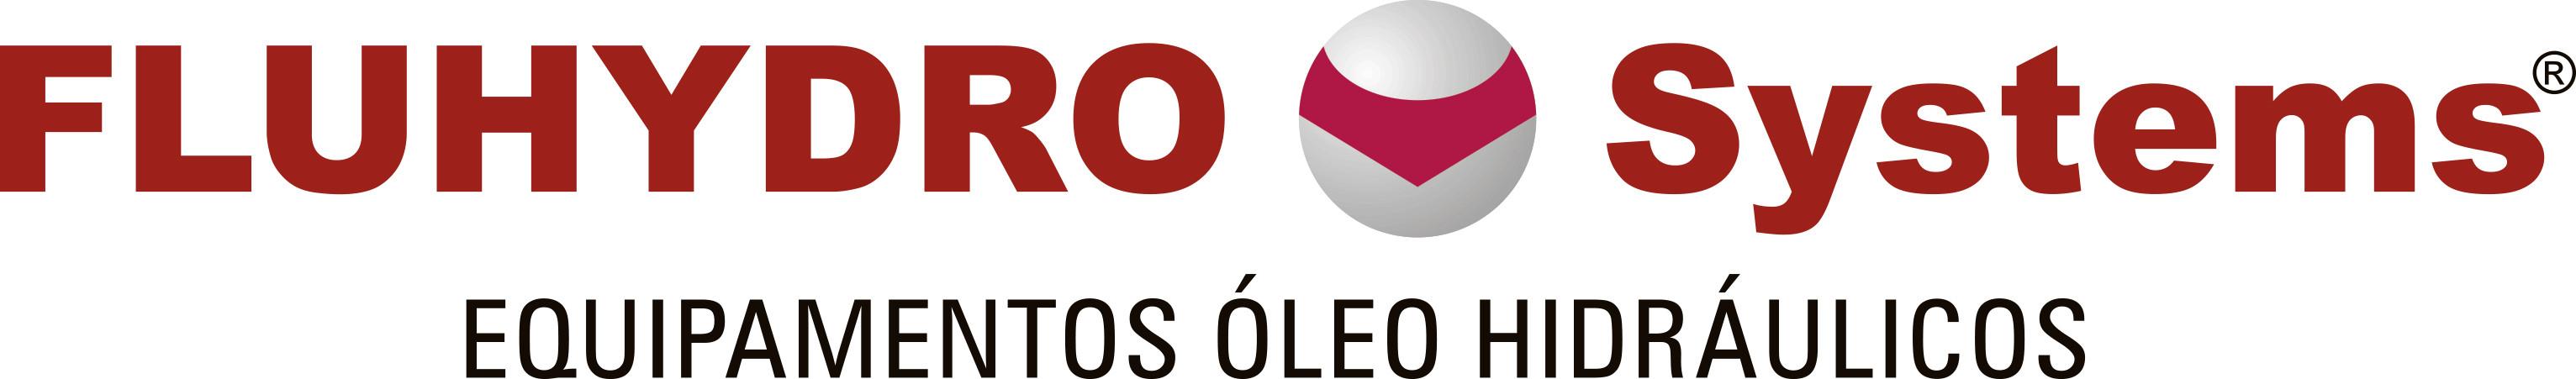 Fluhydro_Logotipo.jpg